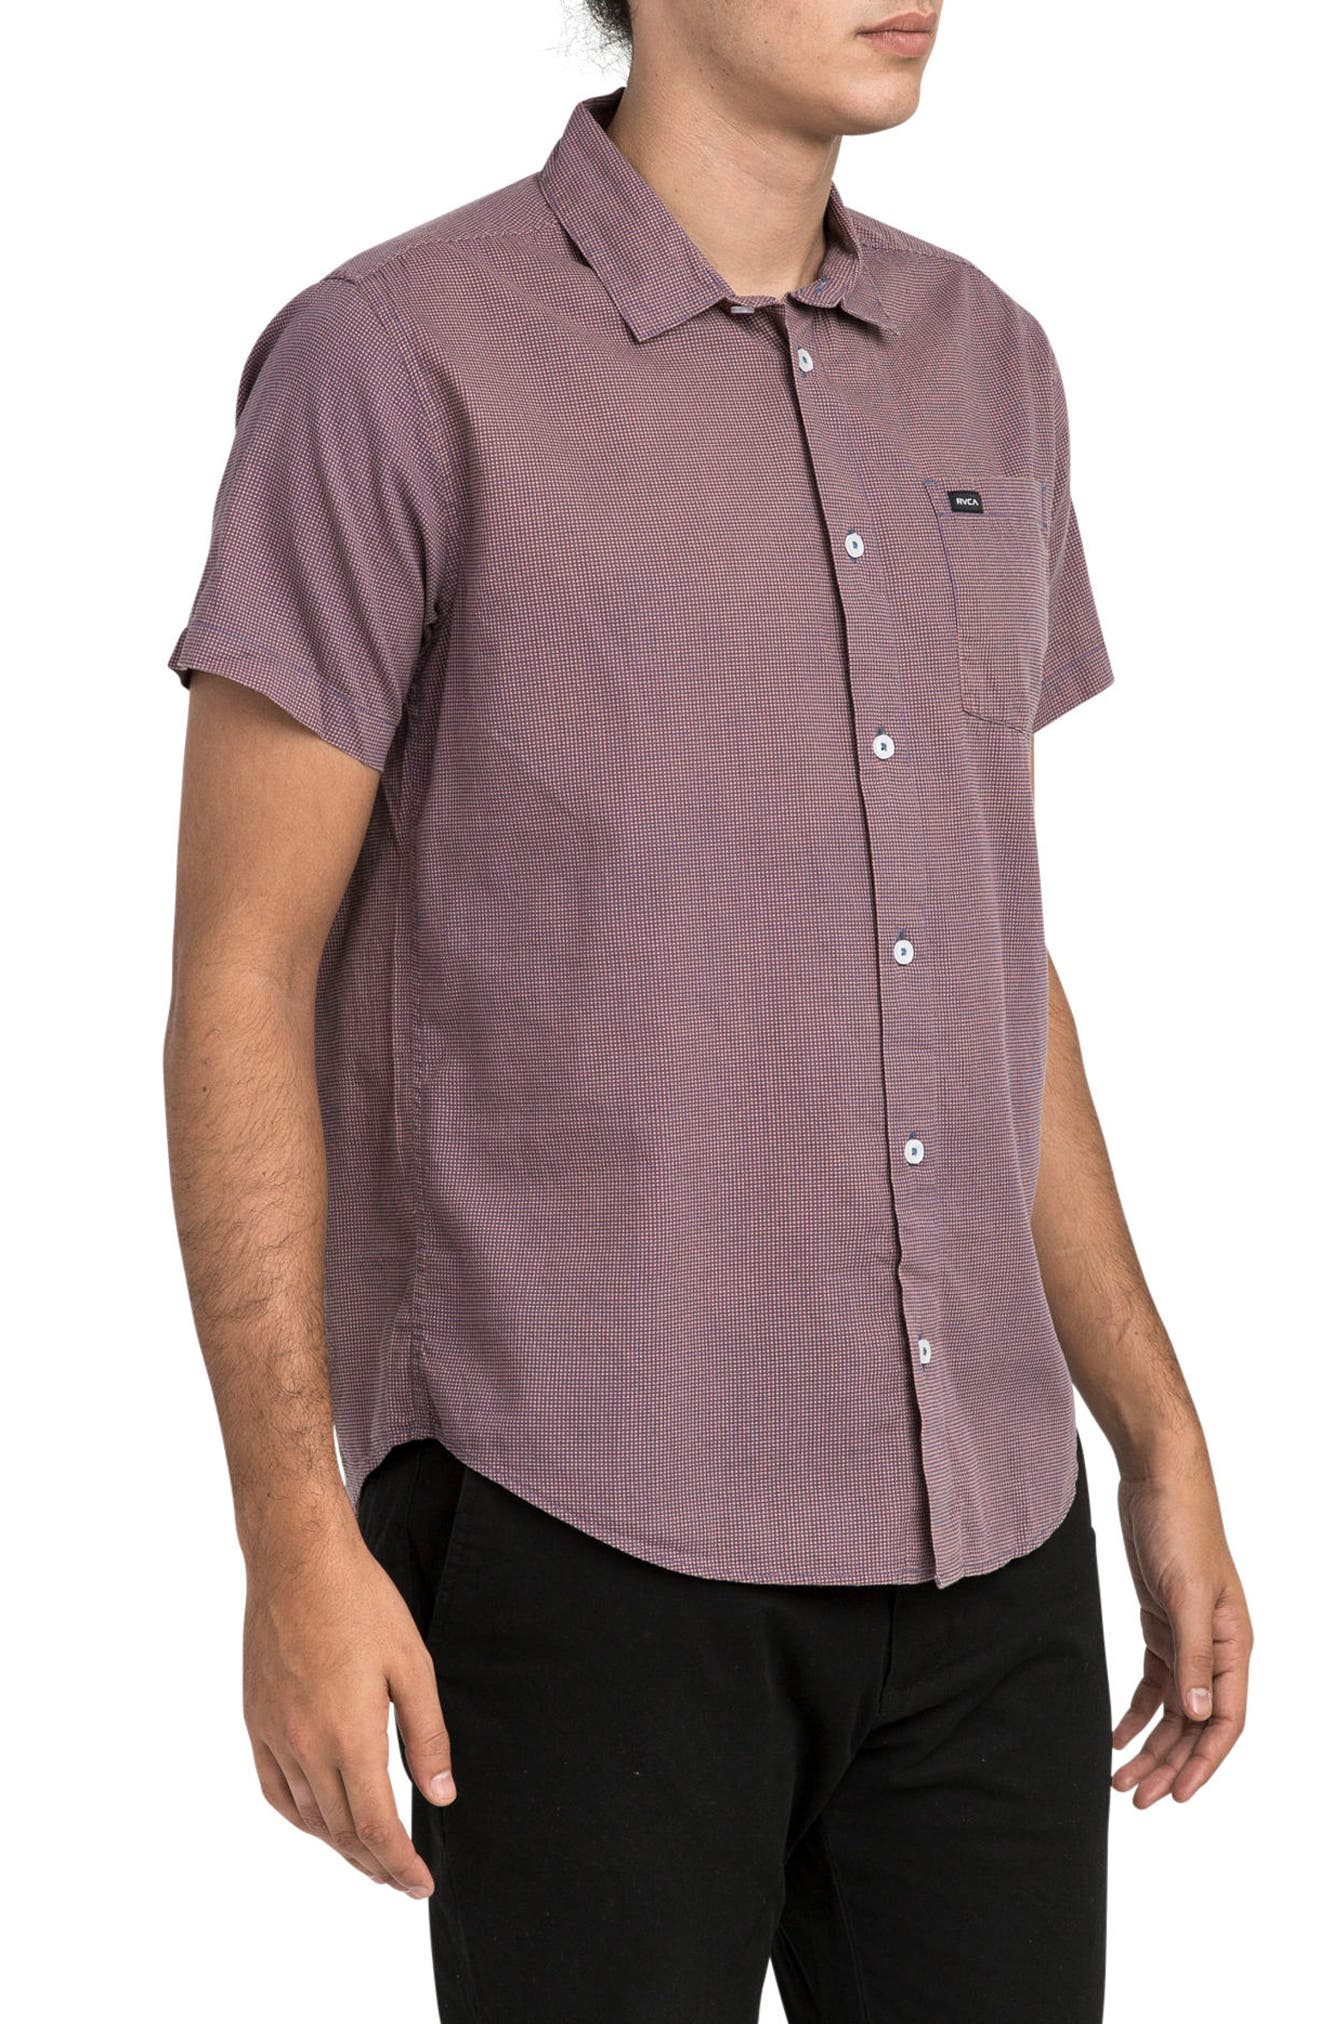 No Name Woven Shirt,                             Alternate thumbnail 3, color,                             600